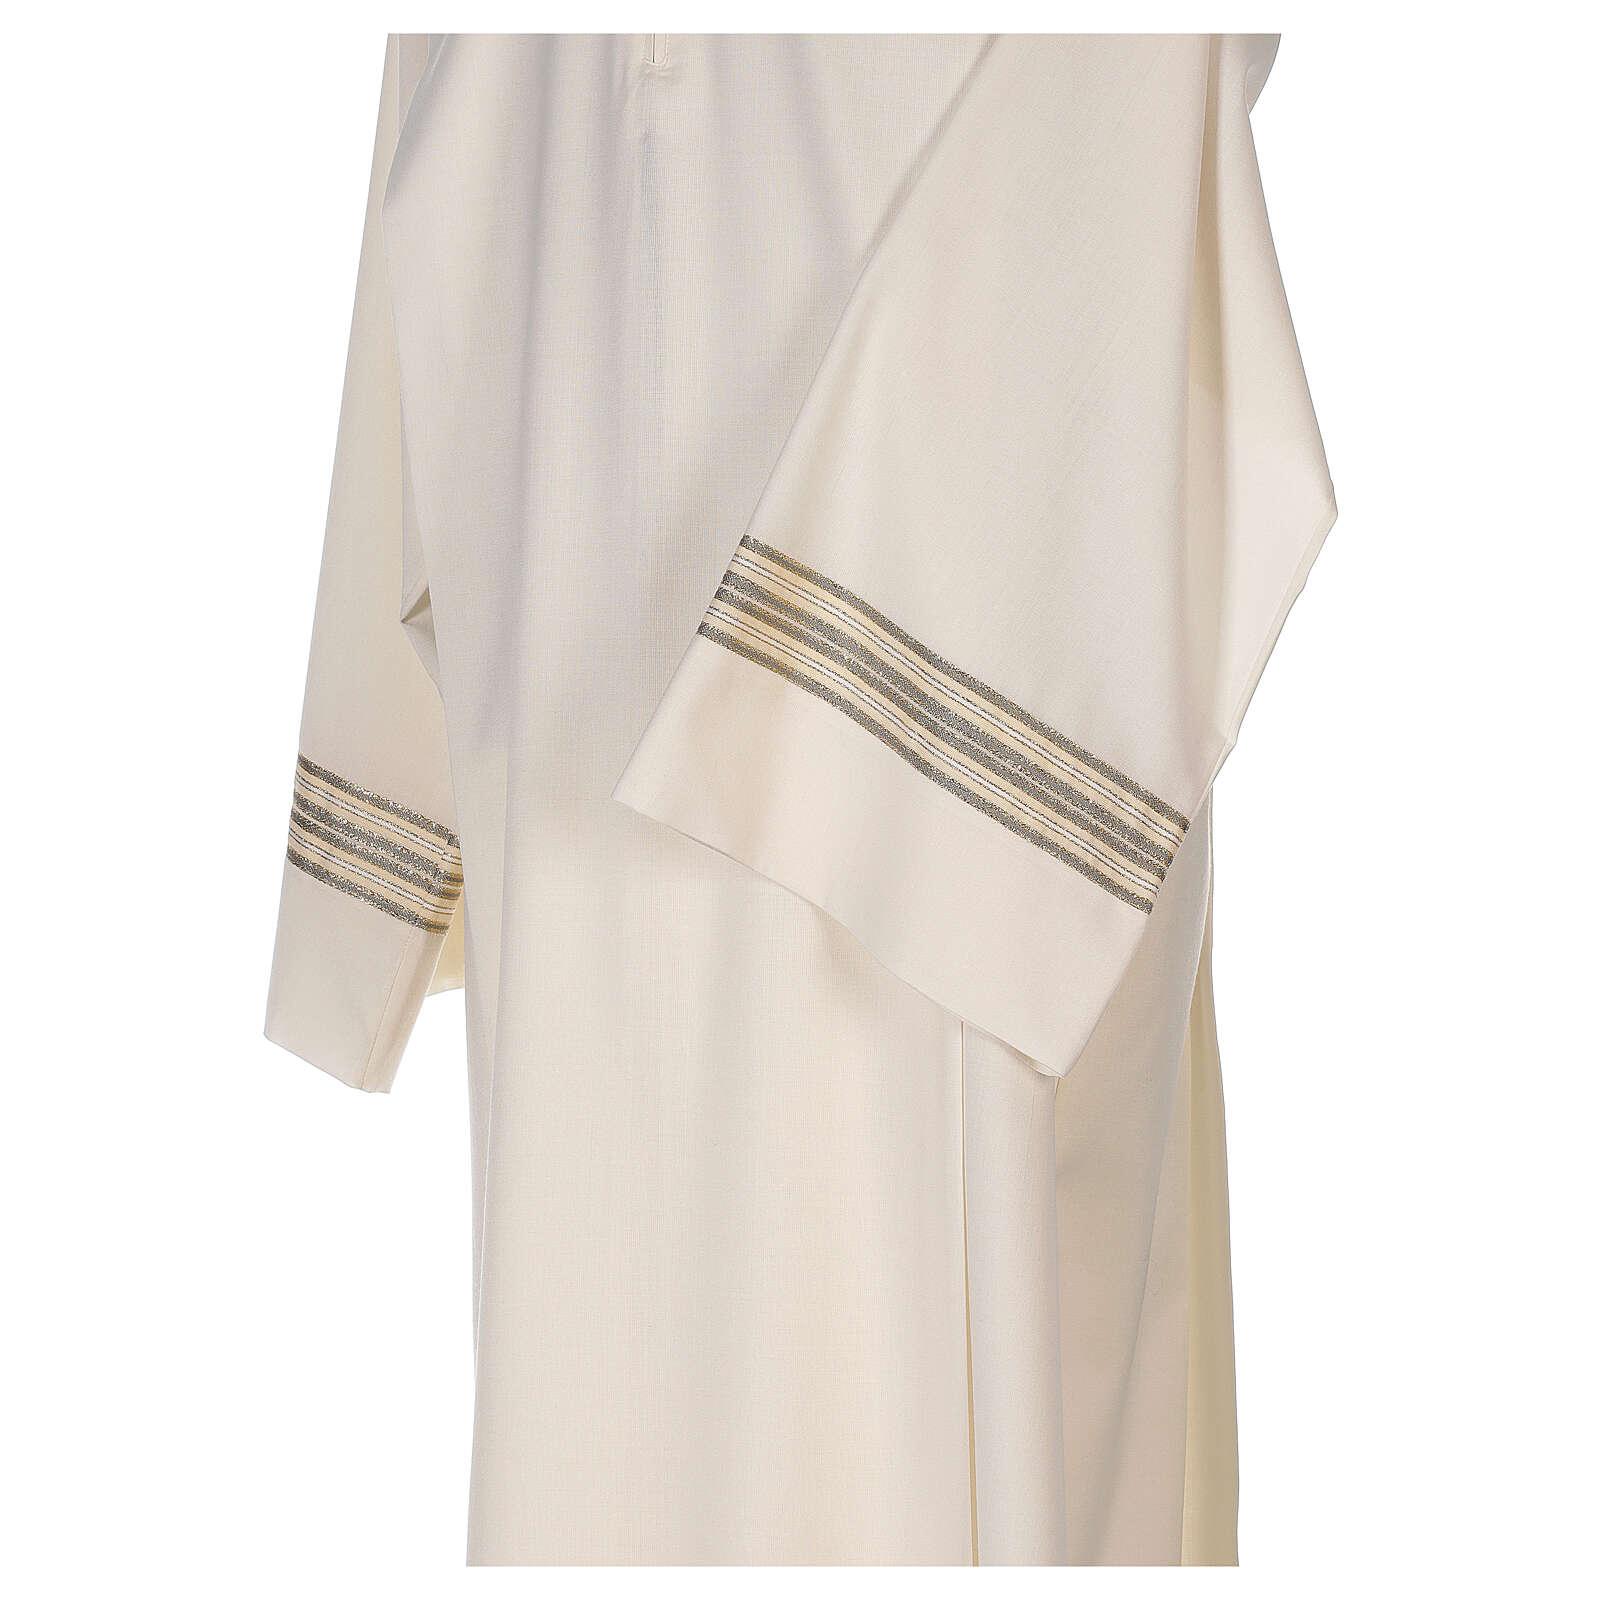 Alba 55% poliéster 45% lana rayas oro marfil 4